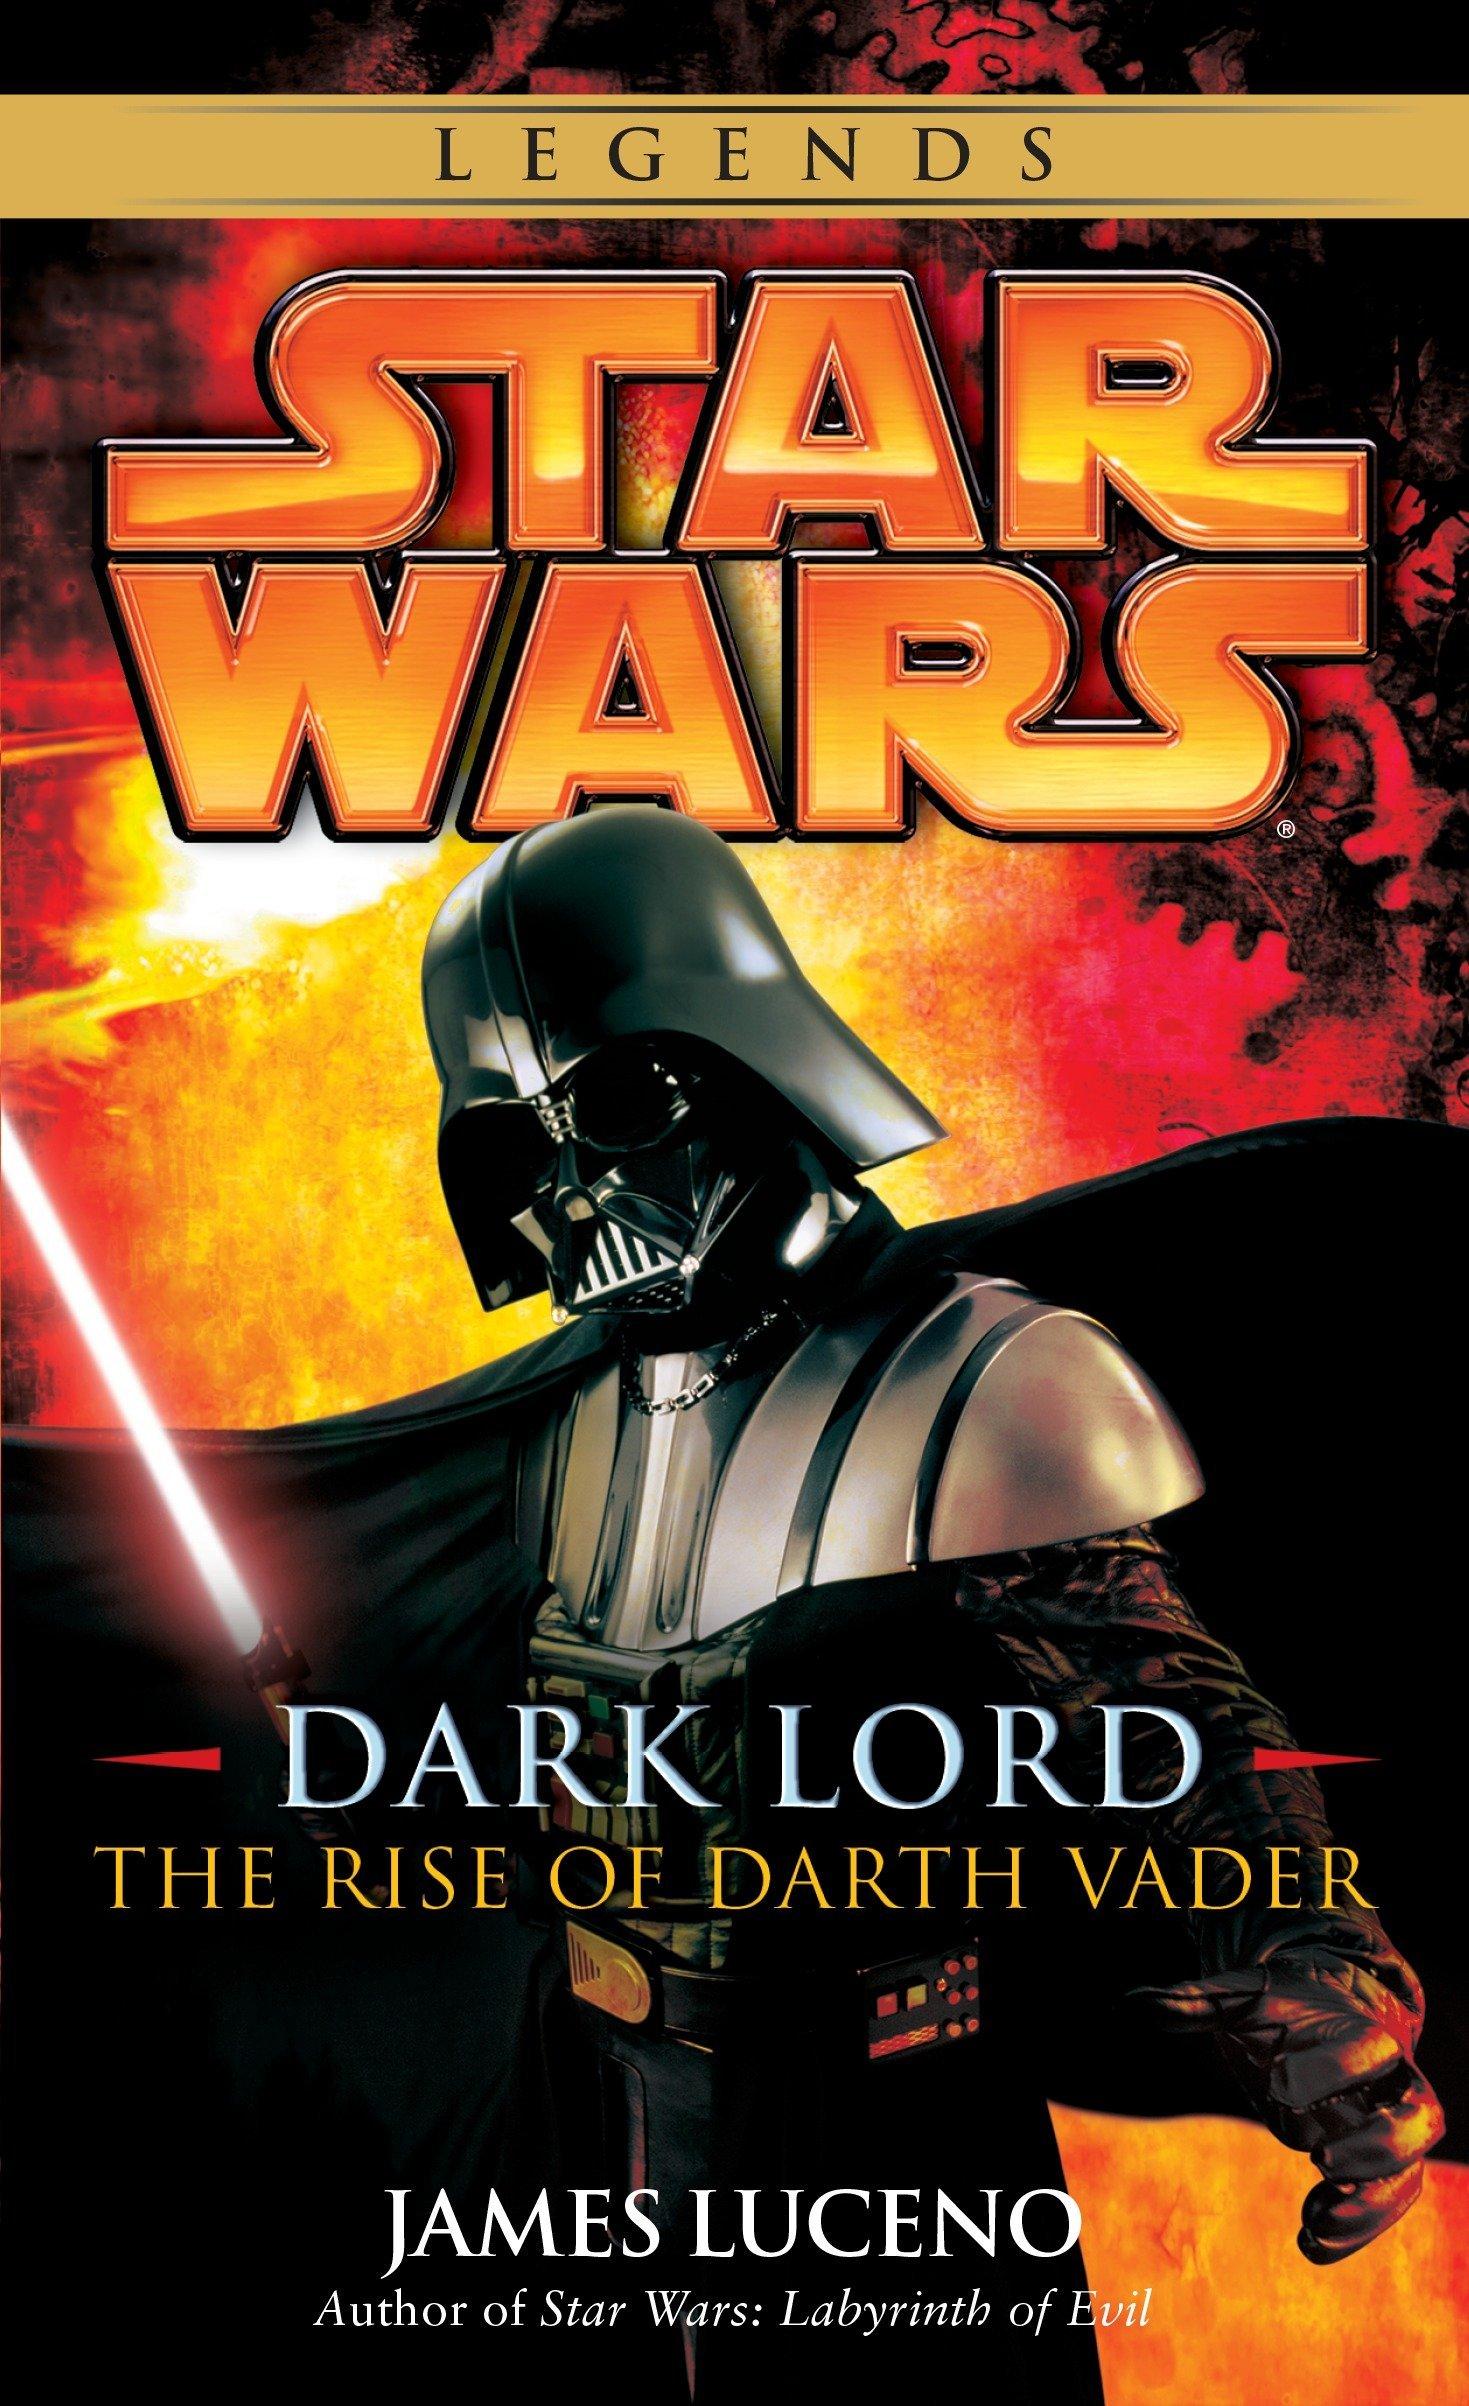 Amazon Com Dark Lord The Rise Of Darth Vader Star Wars 9780345477330 Luceno James Books